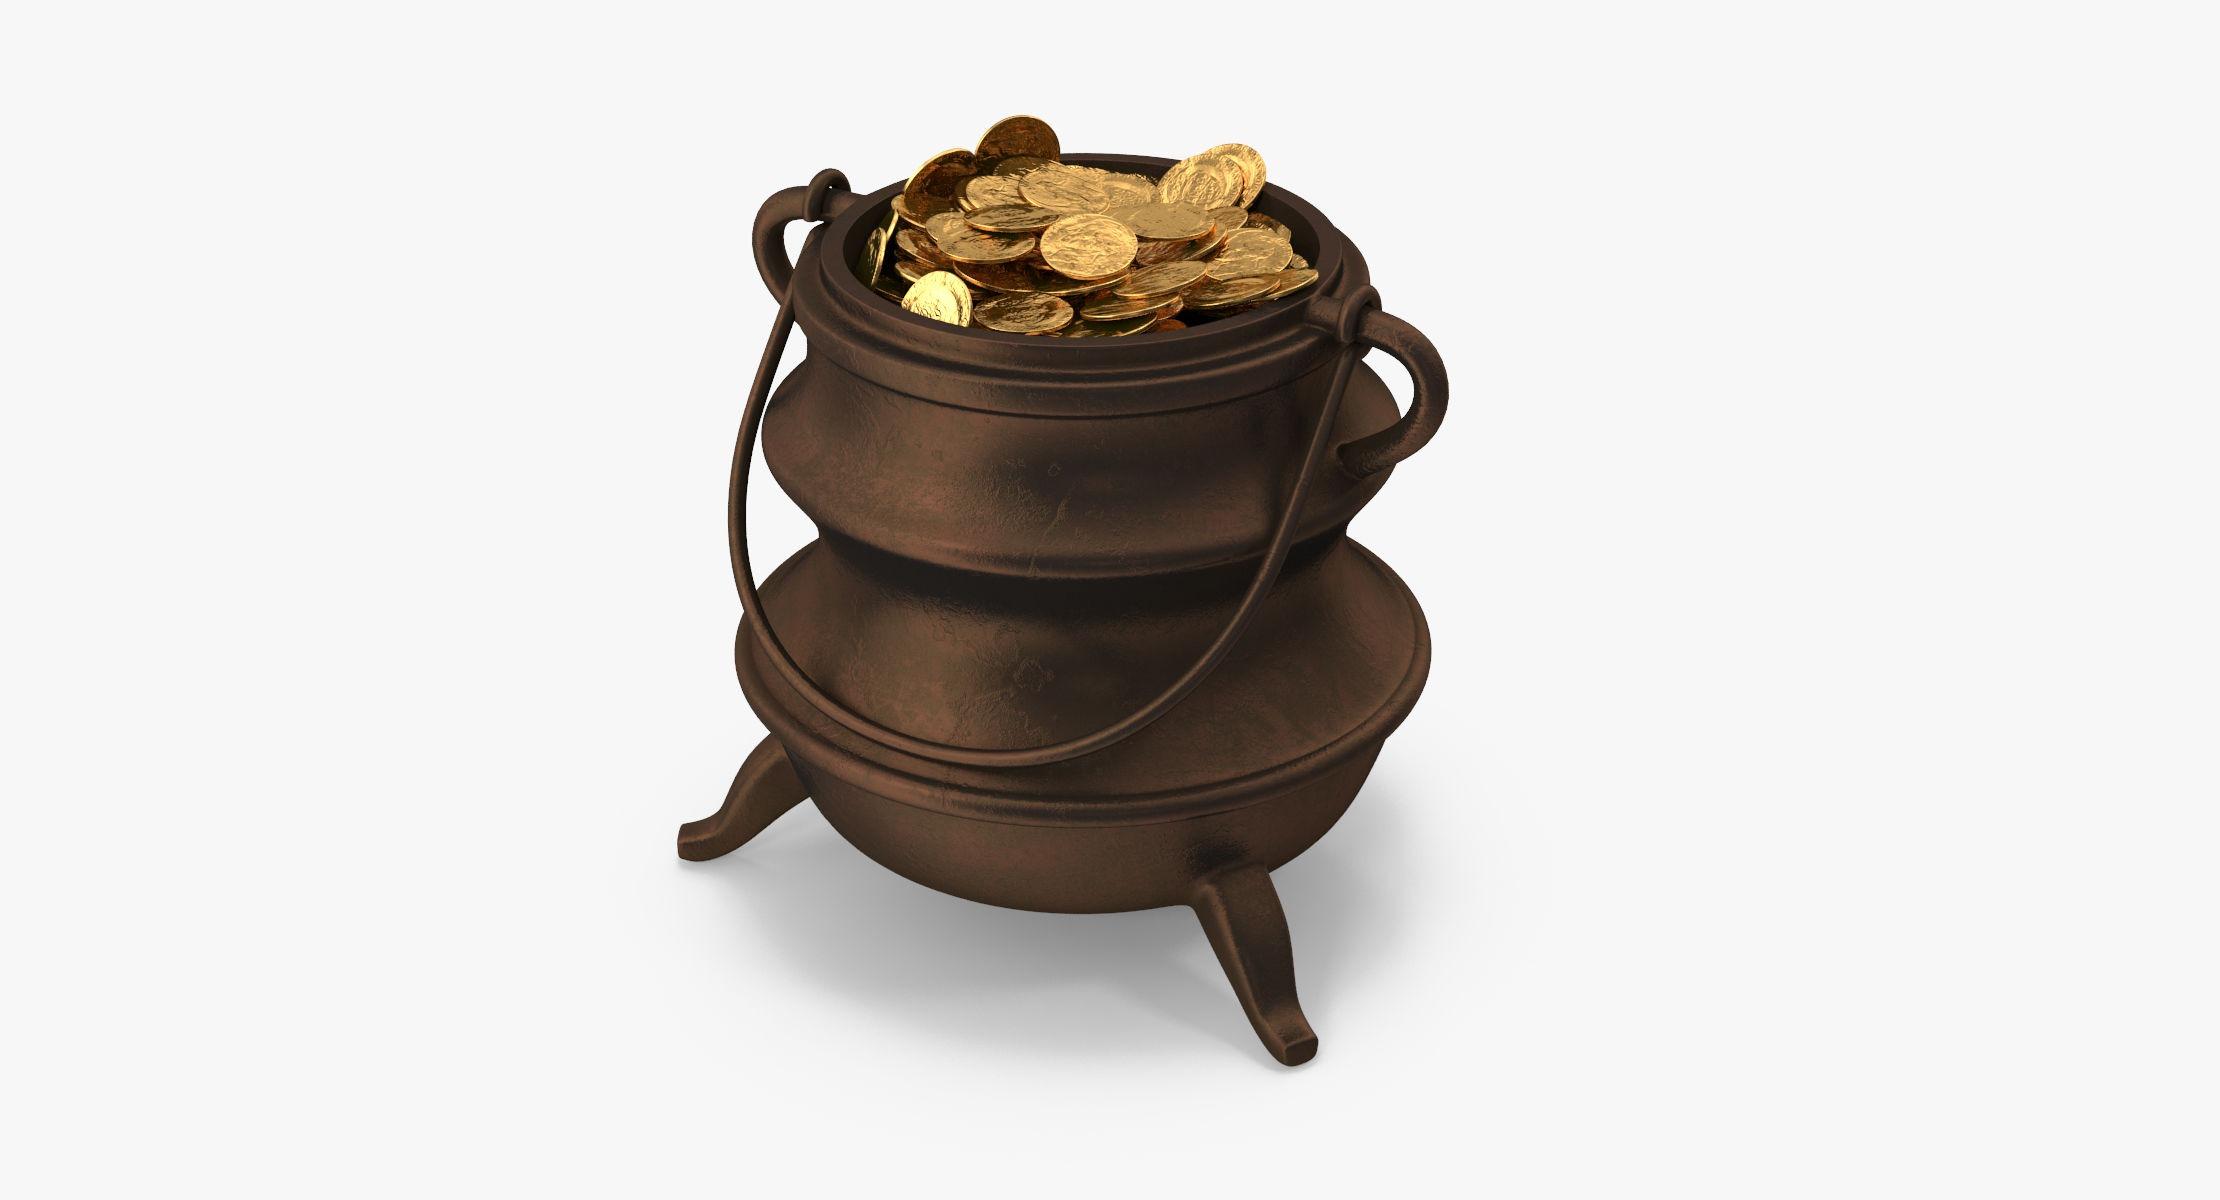 Pot of Gold - reel 1